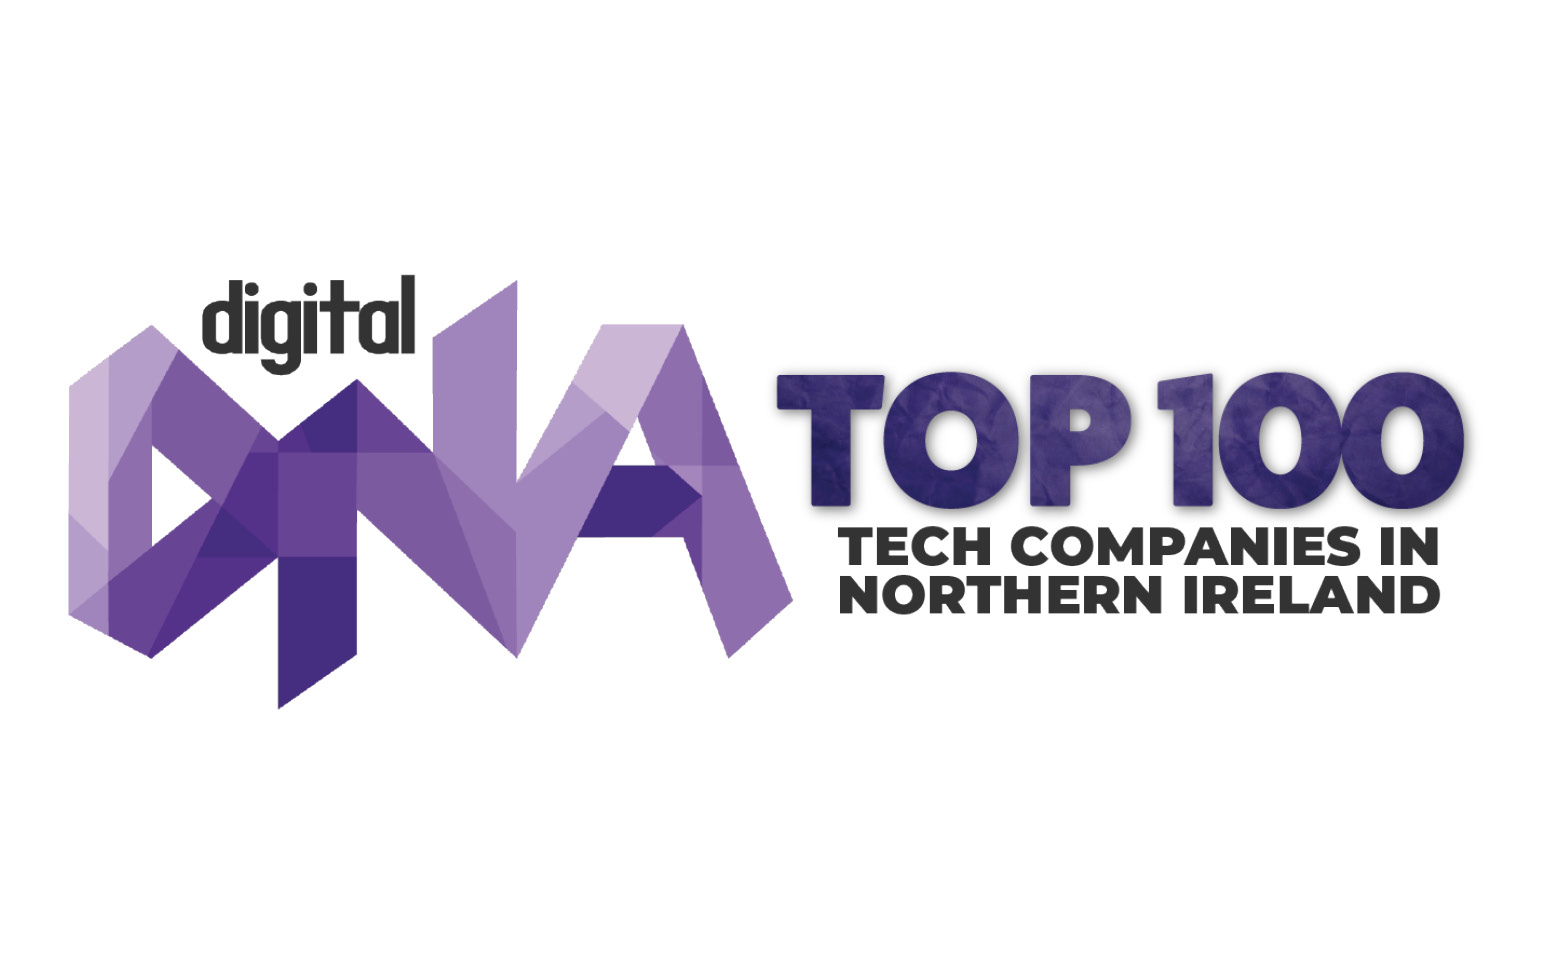 Top 100 Tech Companies in Northern Ireland 2021